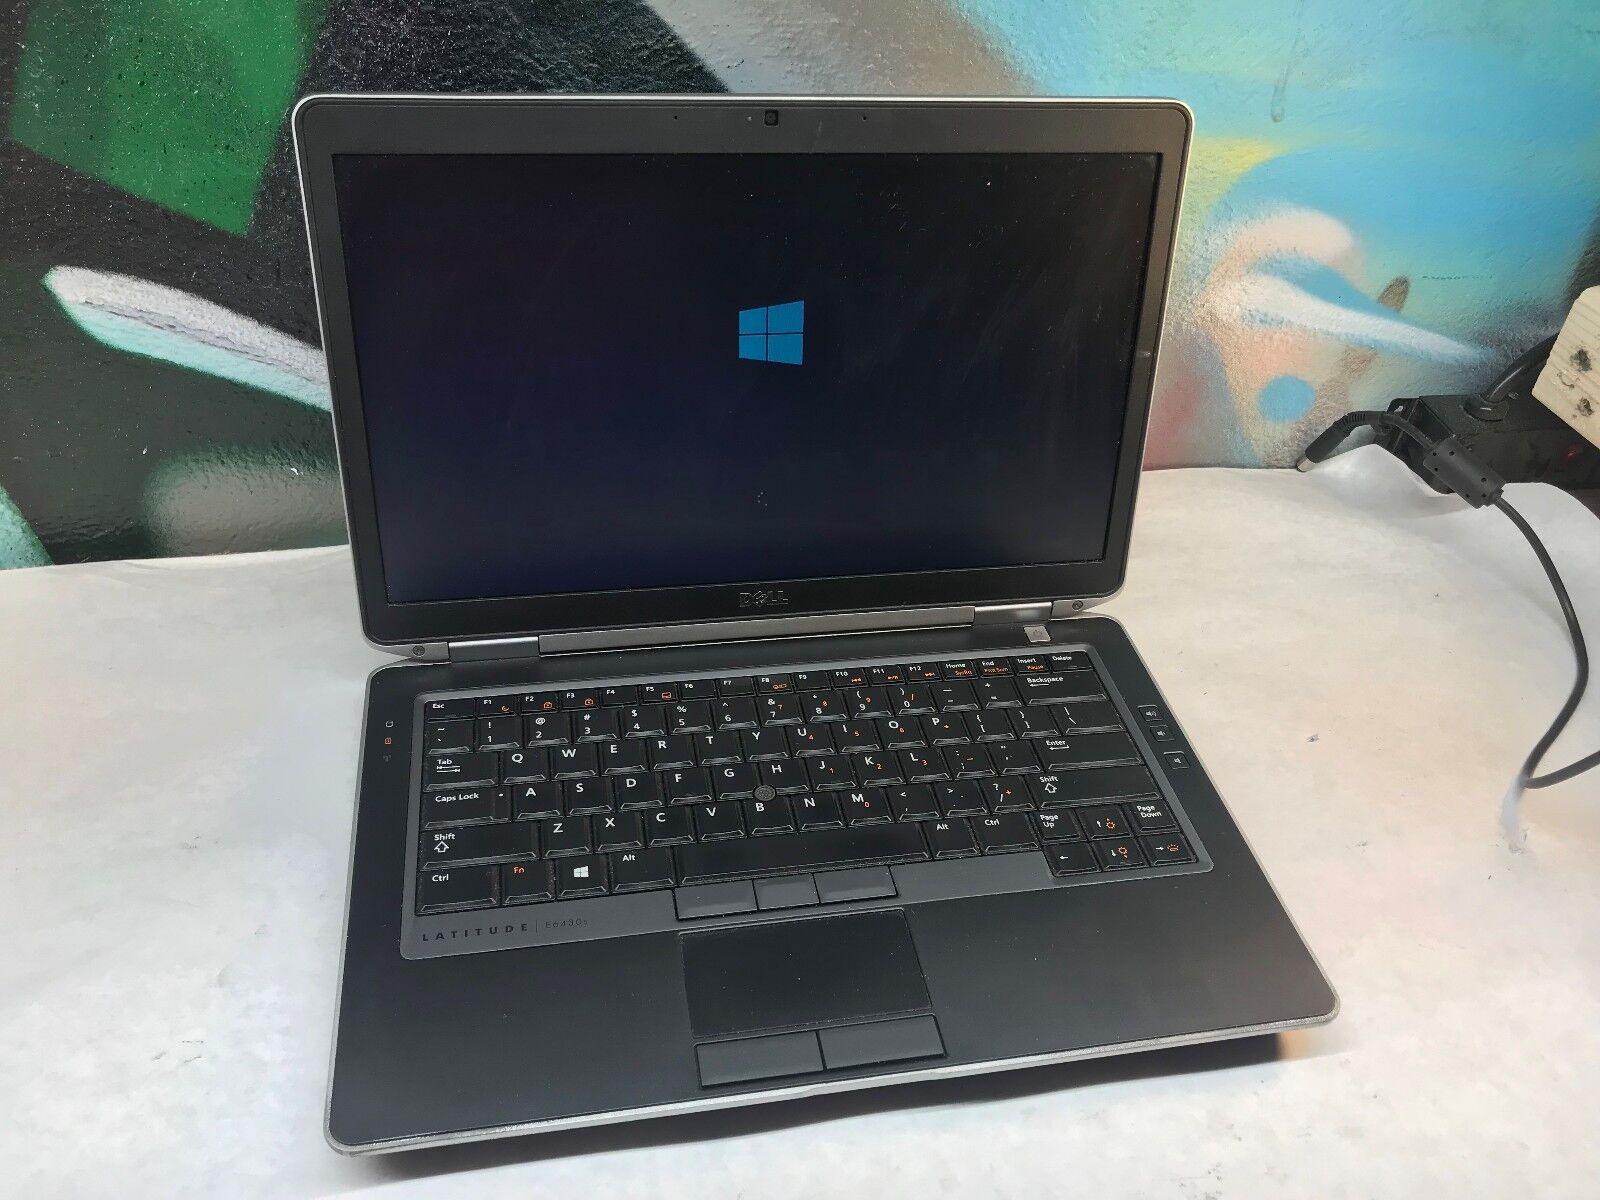 "Dell Latitude E6320 Laptop / Windows 10 / 8GB / i5 2.5GHZ / 14"" LED / TESTED"